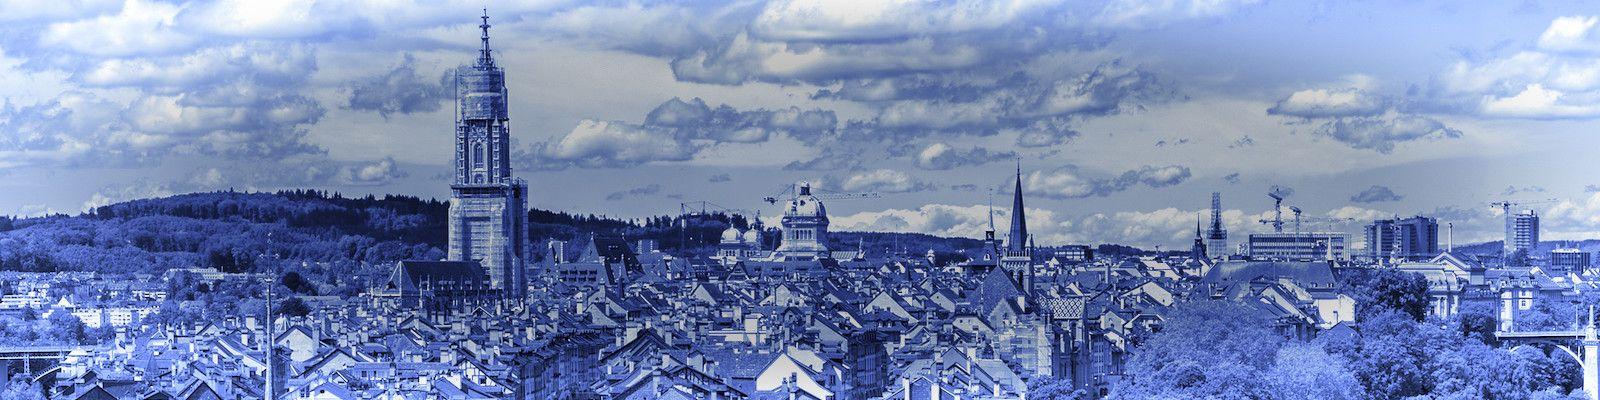 Bern Panoramapano Monochrome